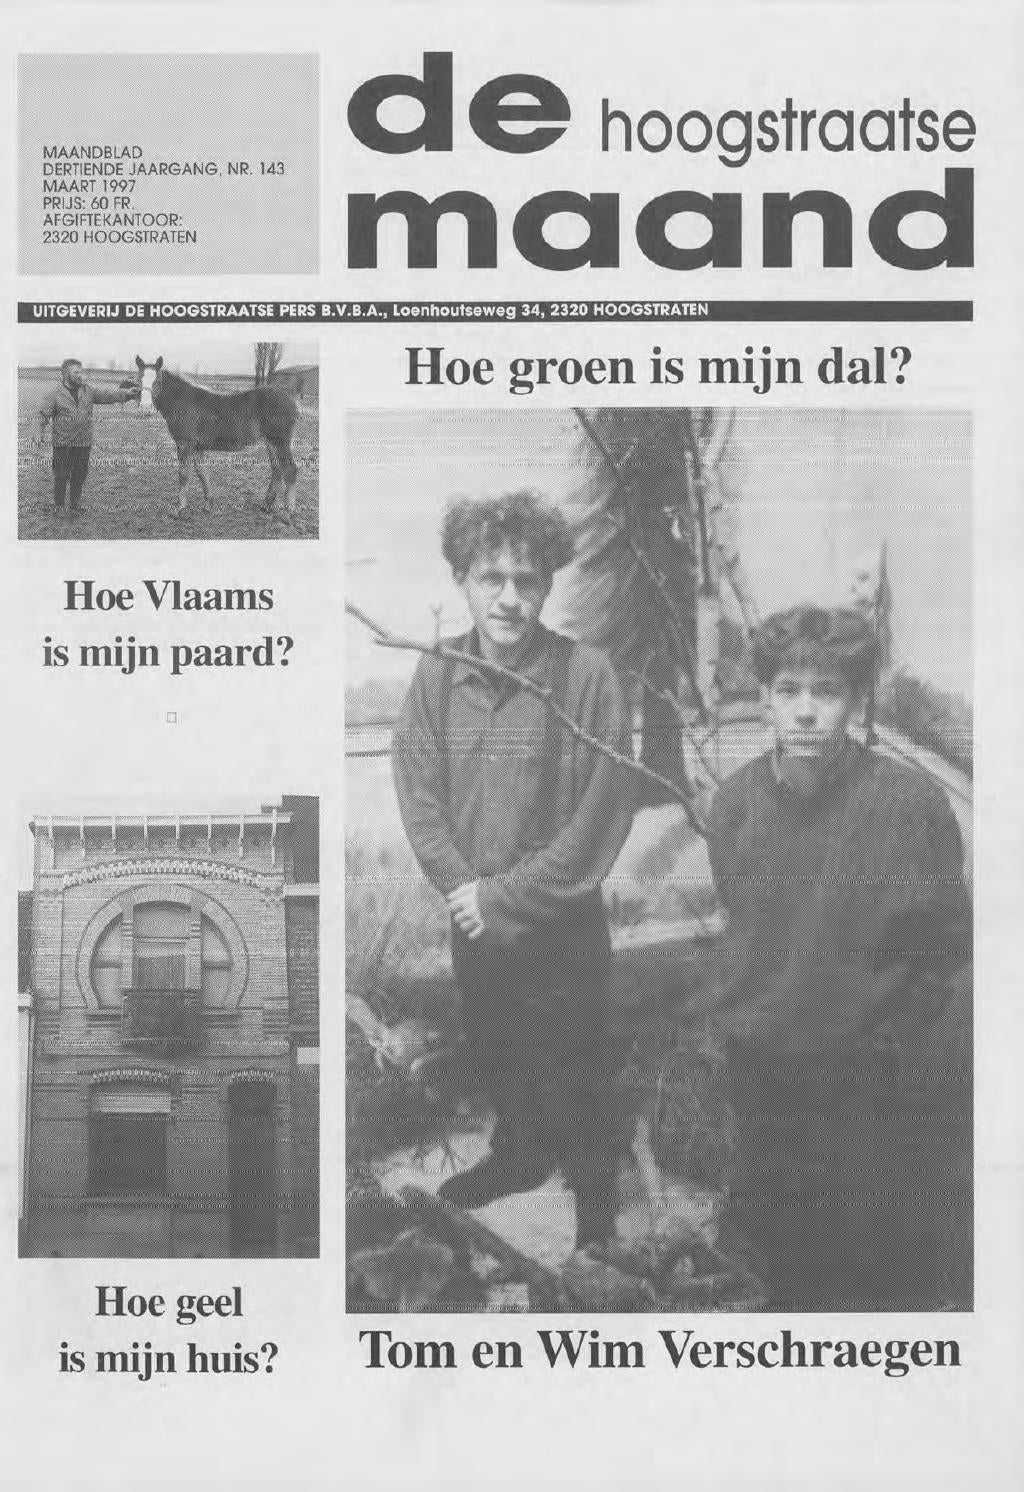 maart 1997  De Hoogstraatse Maand by De Hoogstraatse